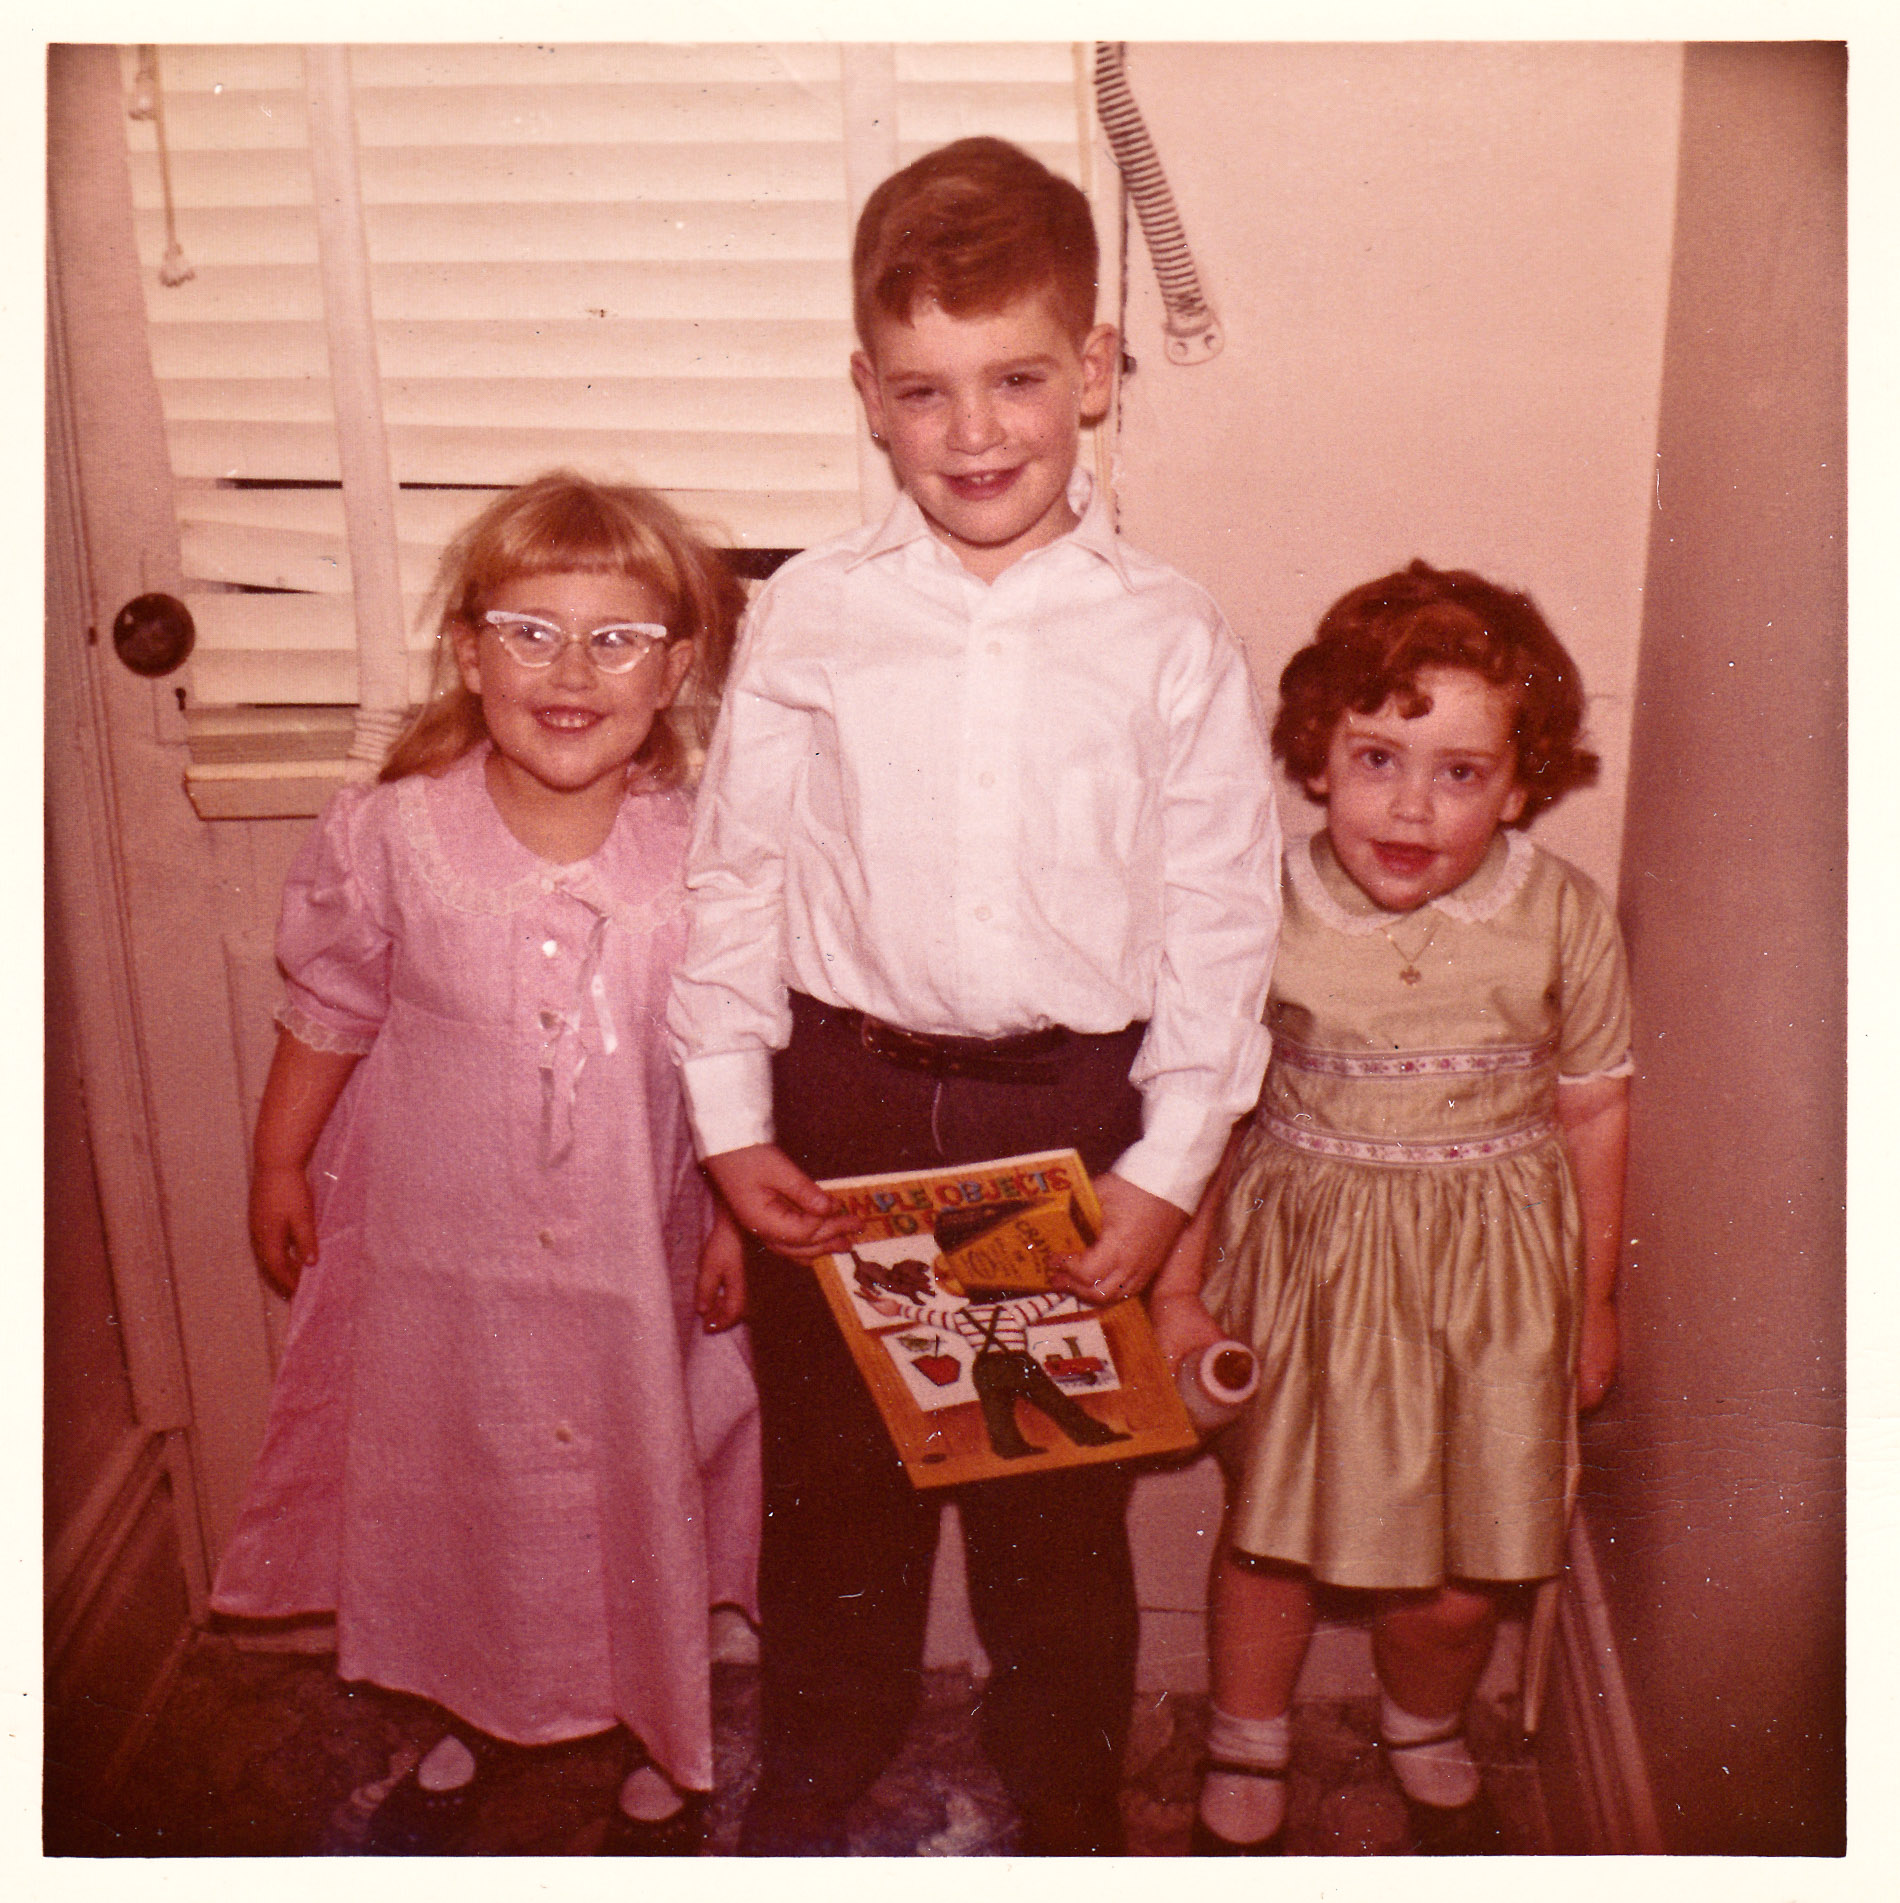 Shelley, Doug, Jodi - Jan 10, 1960 (Shelley's Birthday)